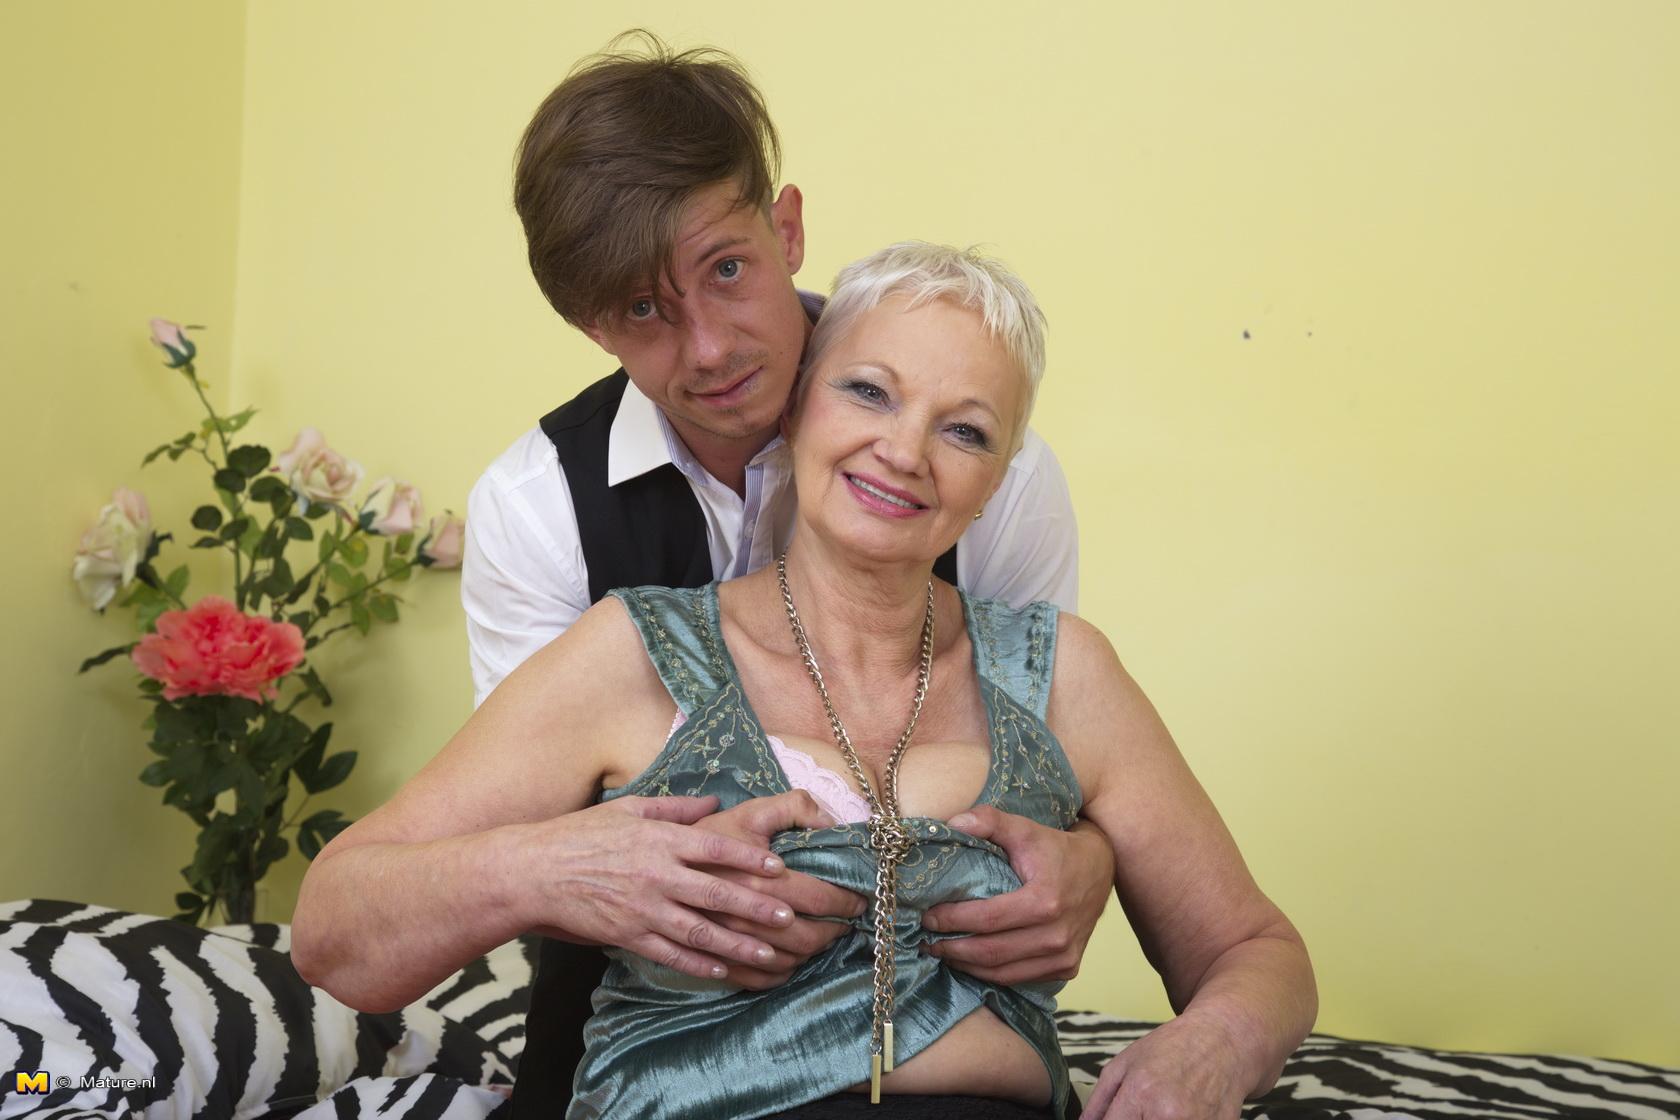 Service single women ukrainian